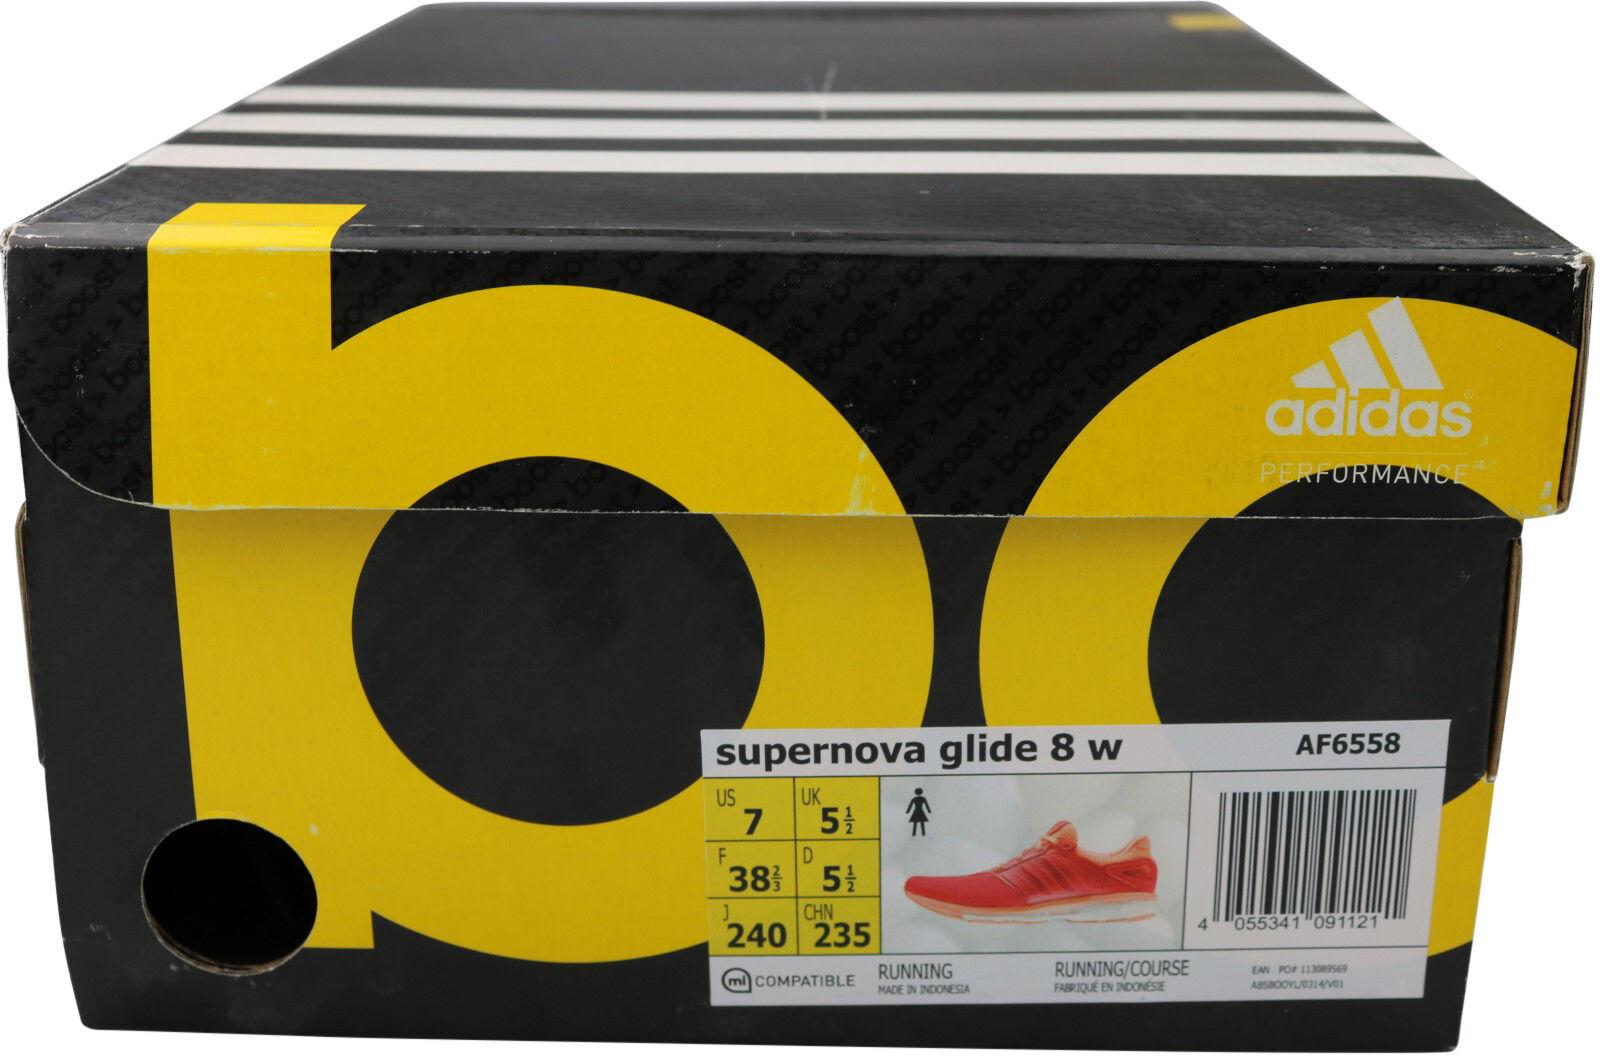 Adidas Supernova Glide 8 Damen Sneaker Laufschuhe AF6558 Gr. Gr. Gr. 36 - 38,5 NEU & OVP abad14